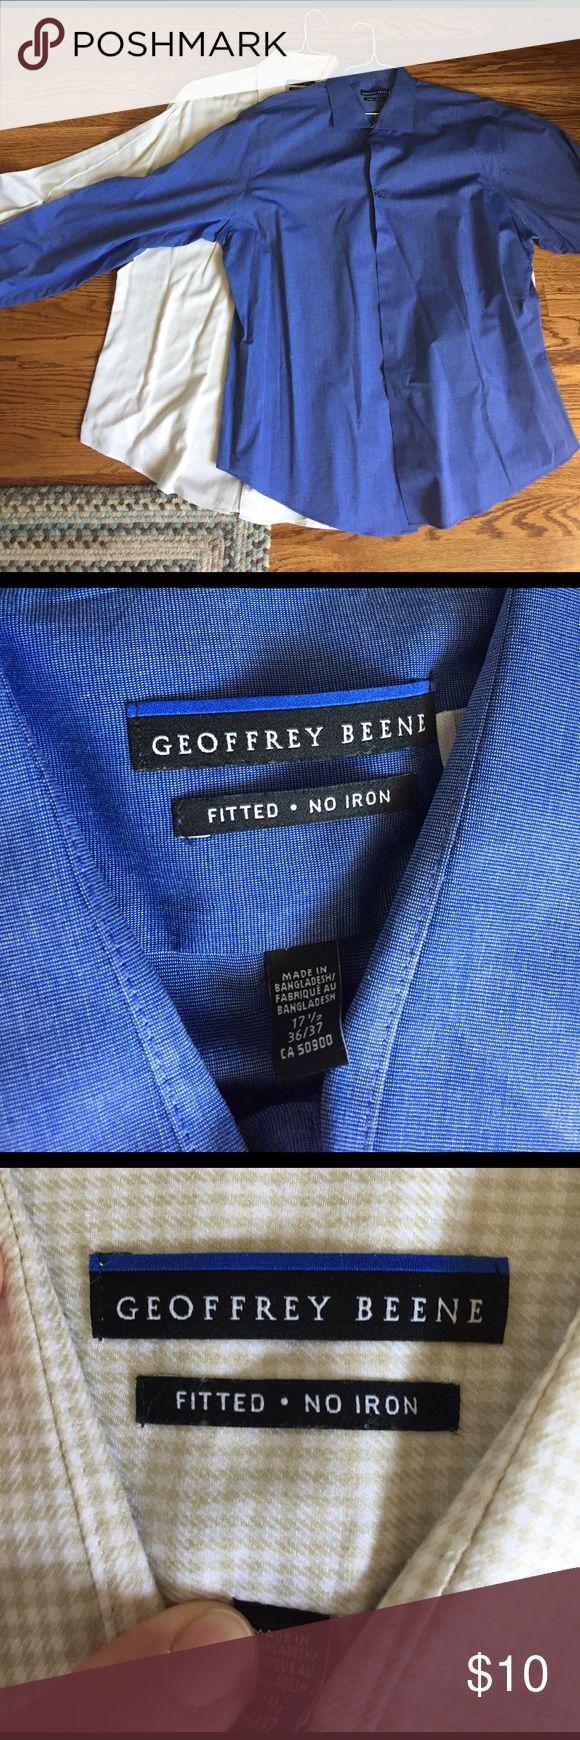 Geoffrey Beene Shirts EUC; size 36/37 Shirts Dress Shirts